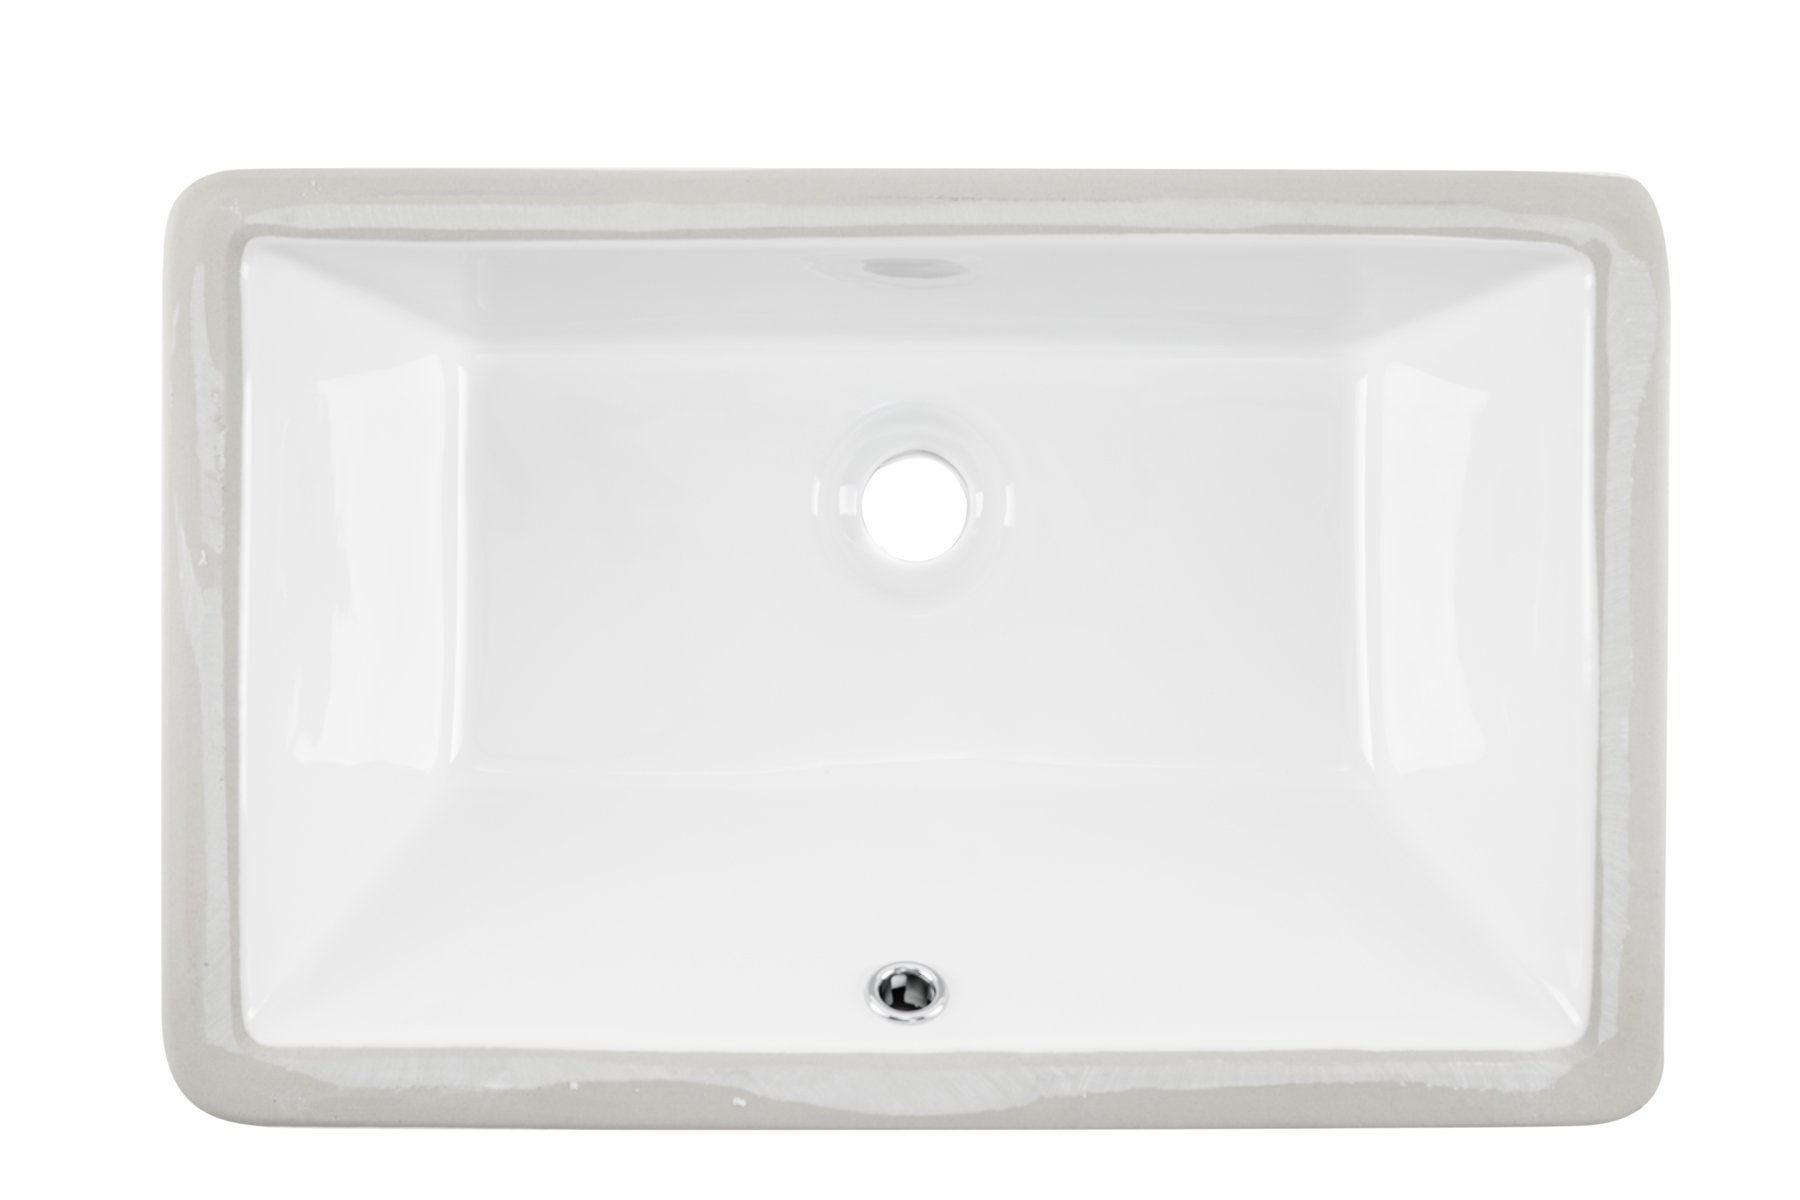 1181CBW 18''x11'' White Rectangular Porcelain Undermount Bathroom Sink